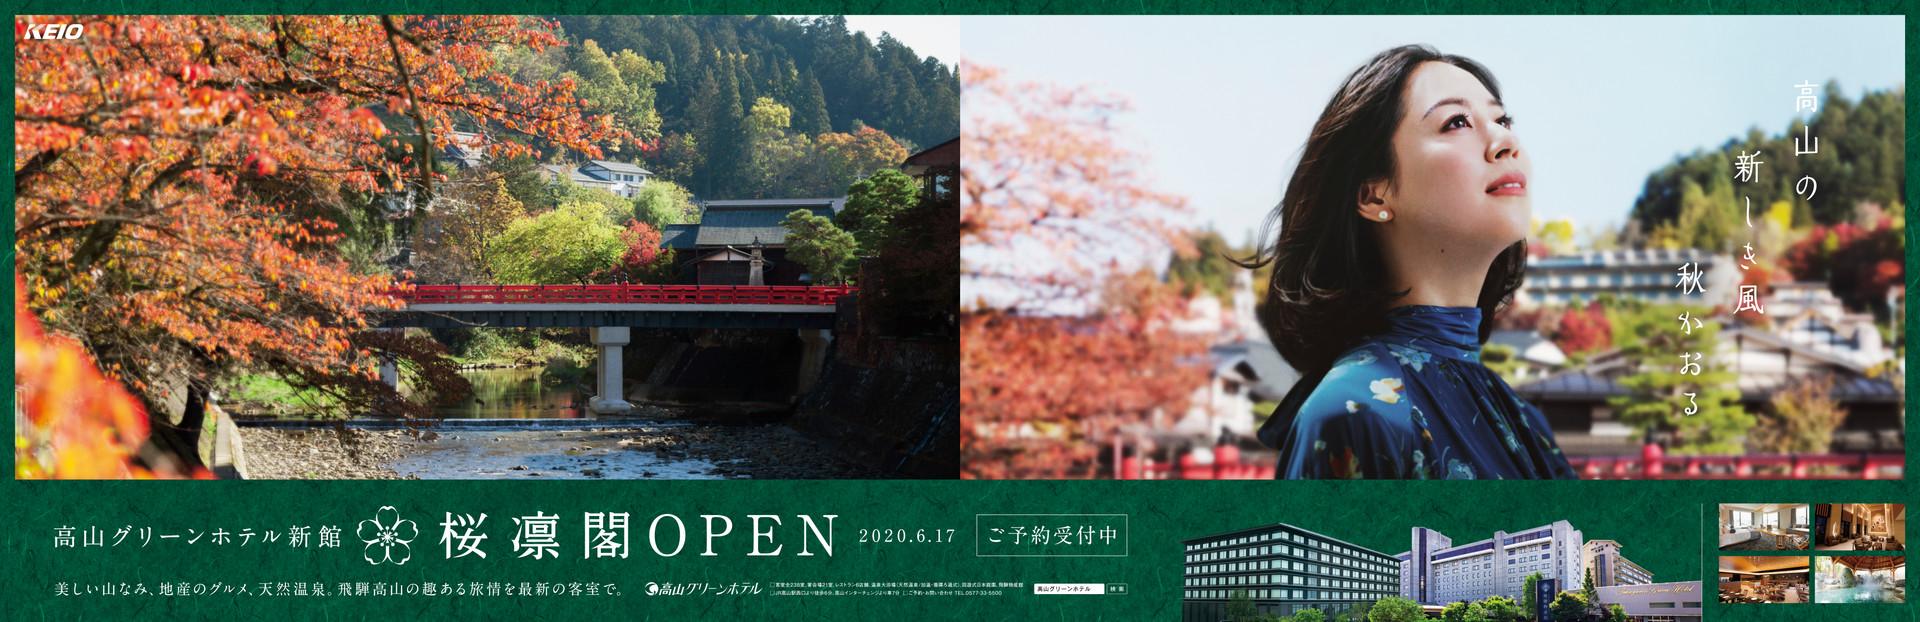 takayama_B3W_nakazuri.jpg